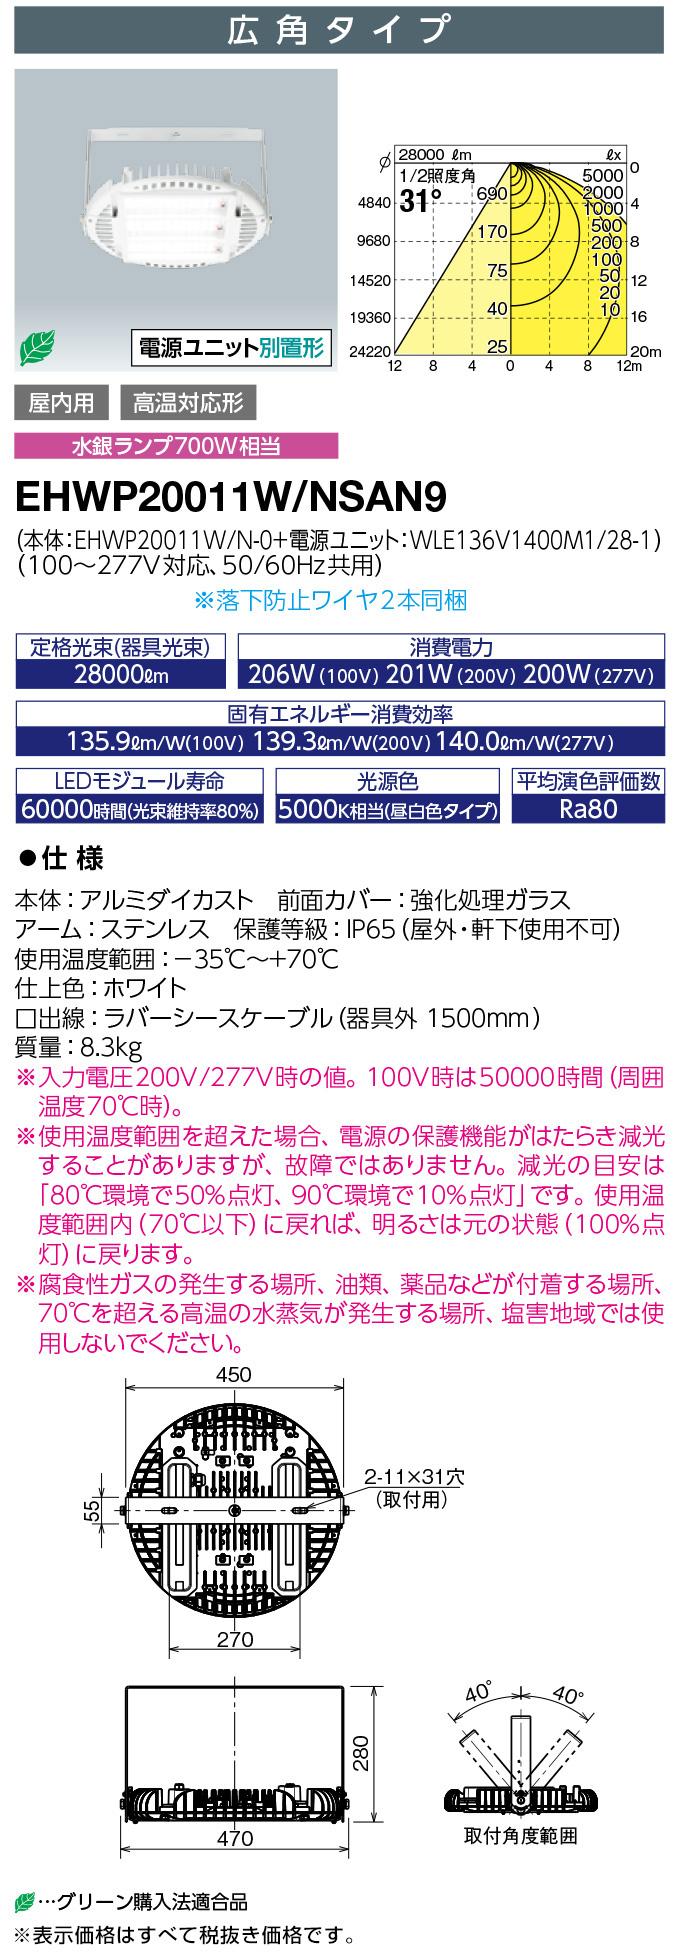 EHWP20011W/NSAN9